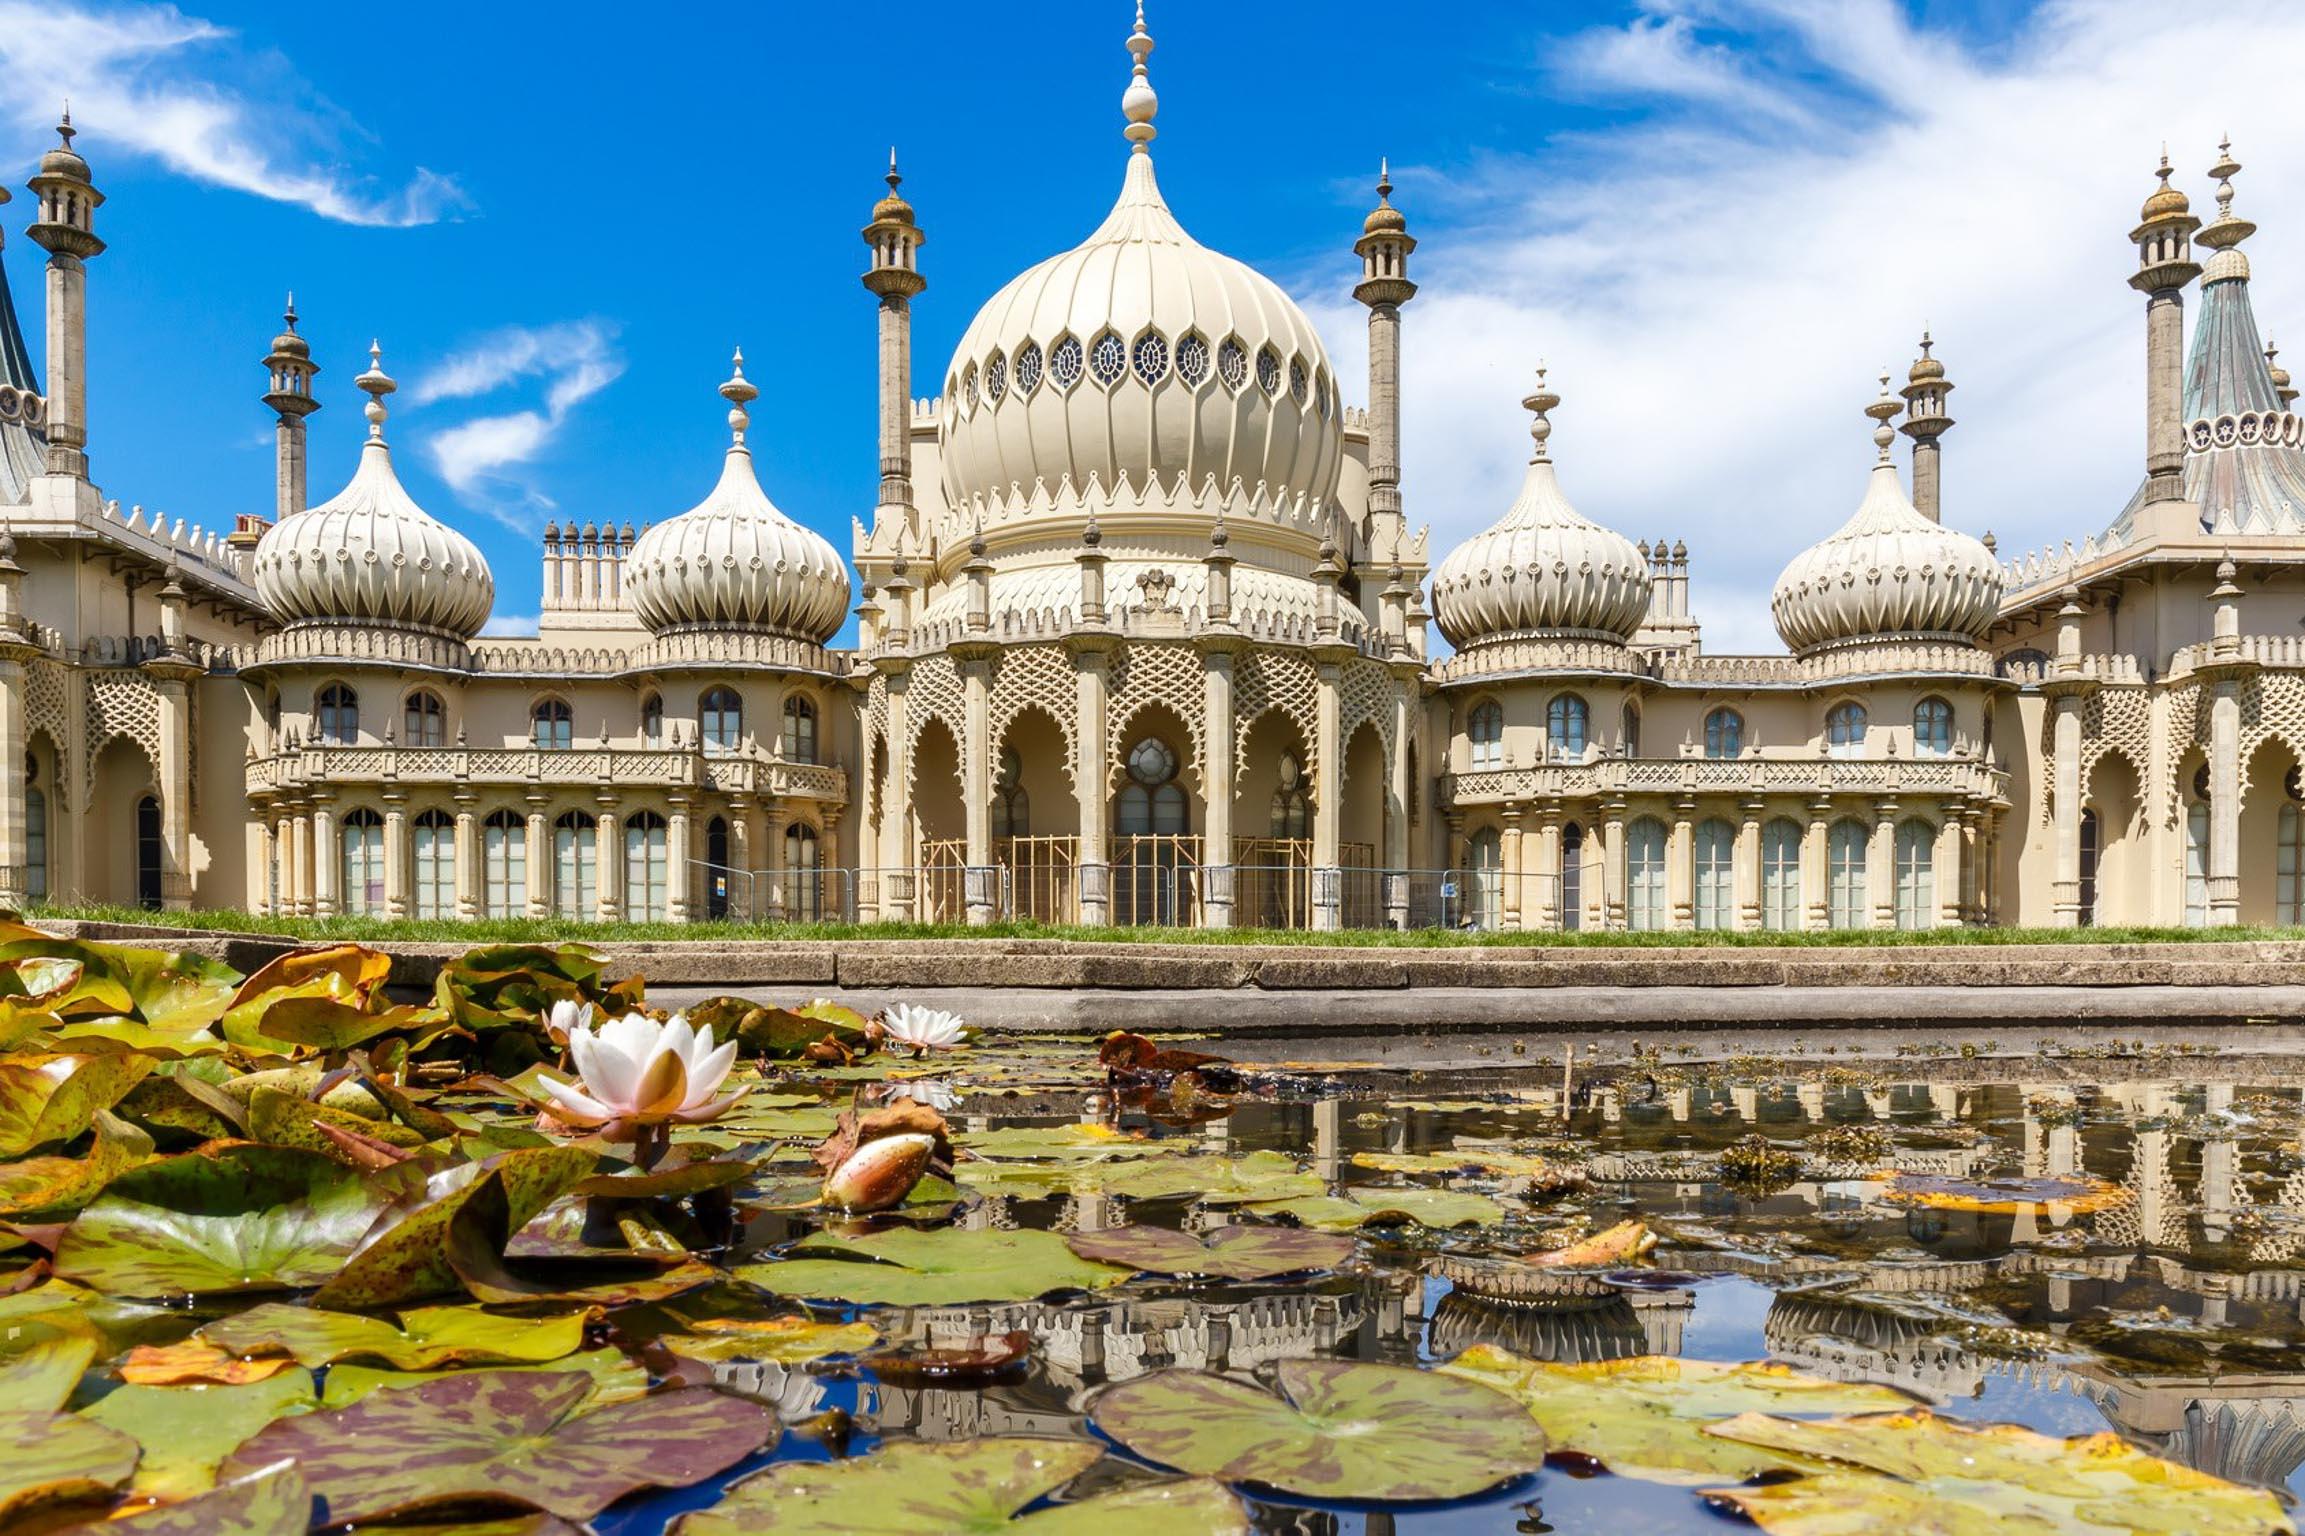 Il Royal Pavilion - Foto di Alexey Fedorenko (Fotolia)